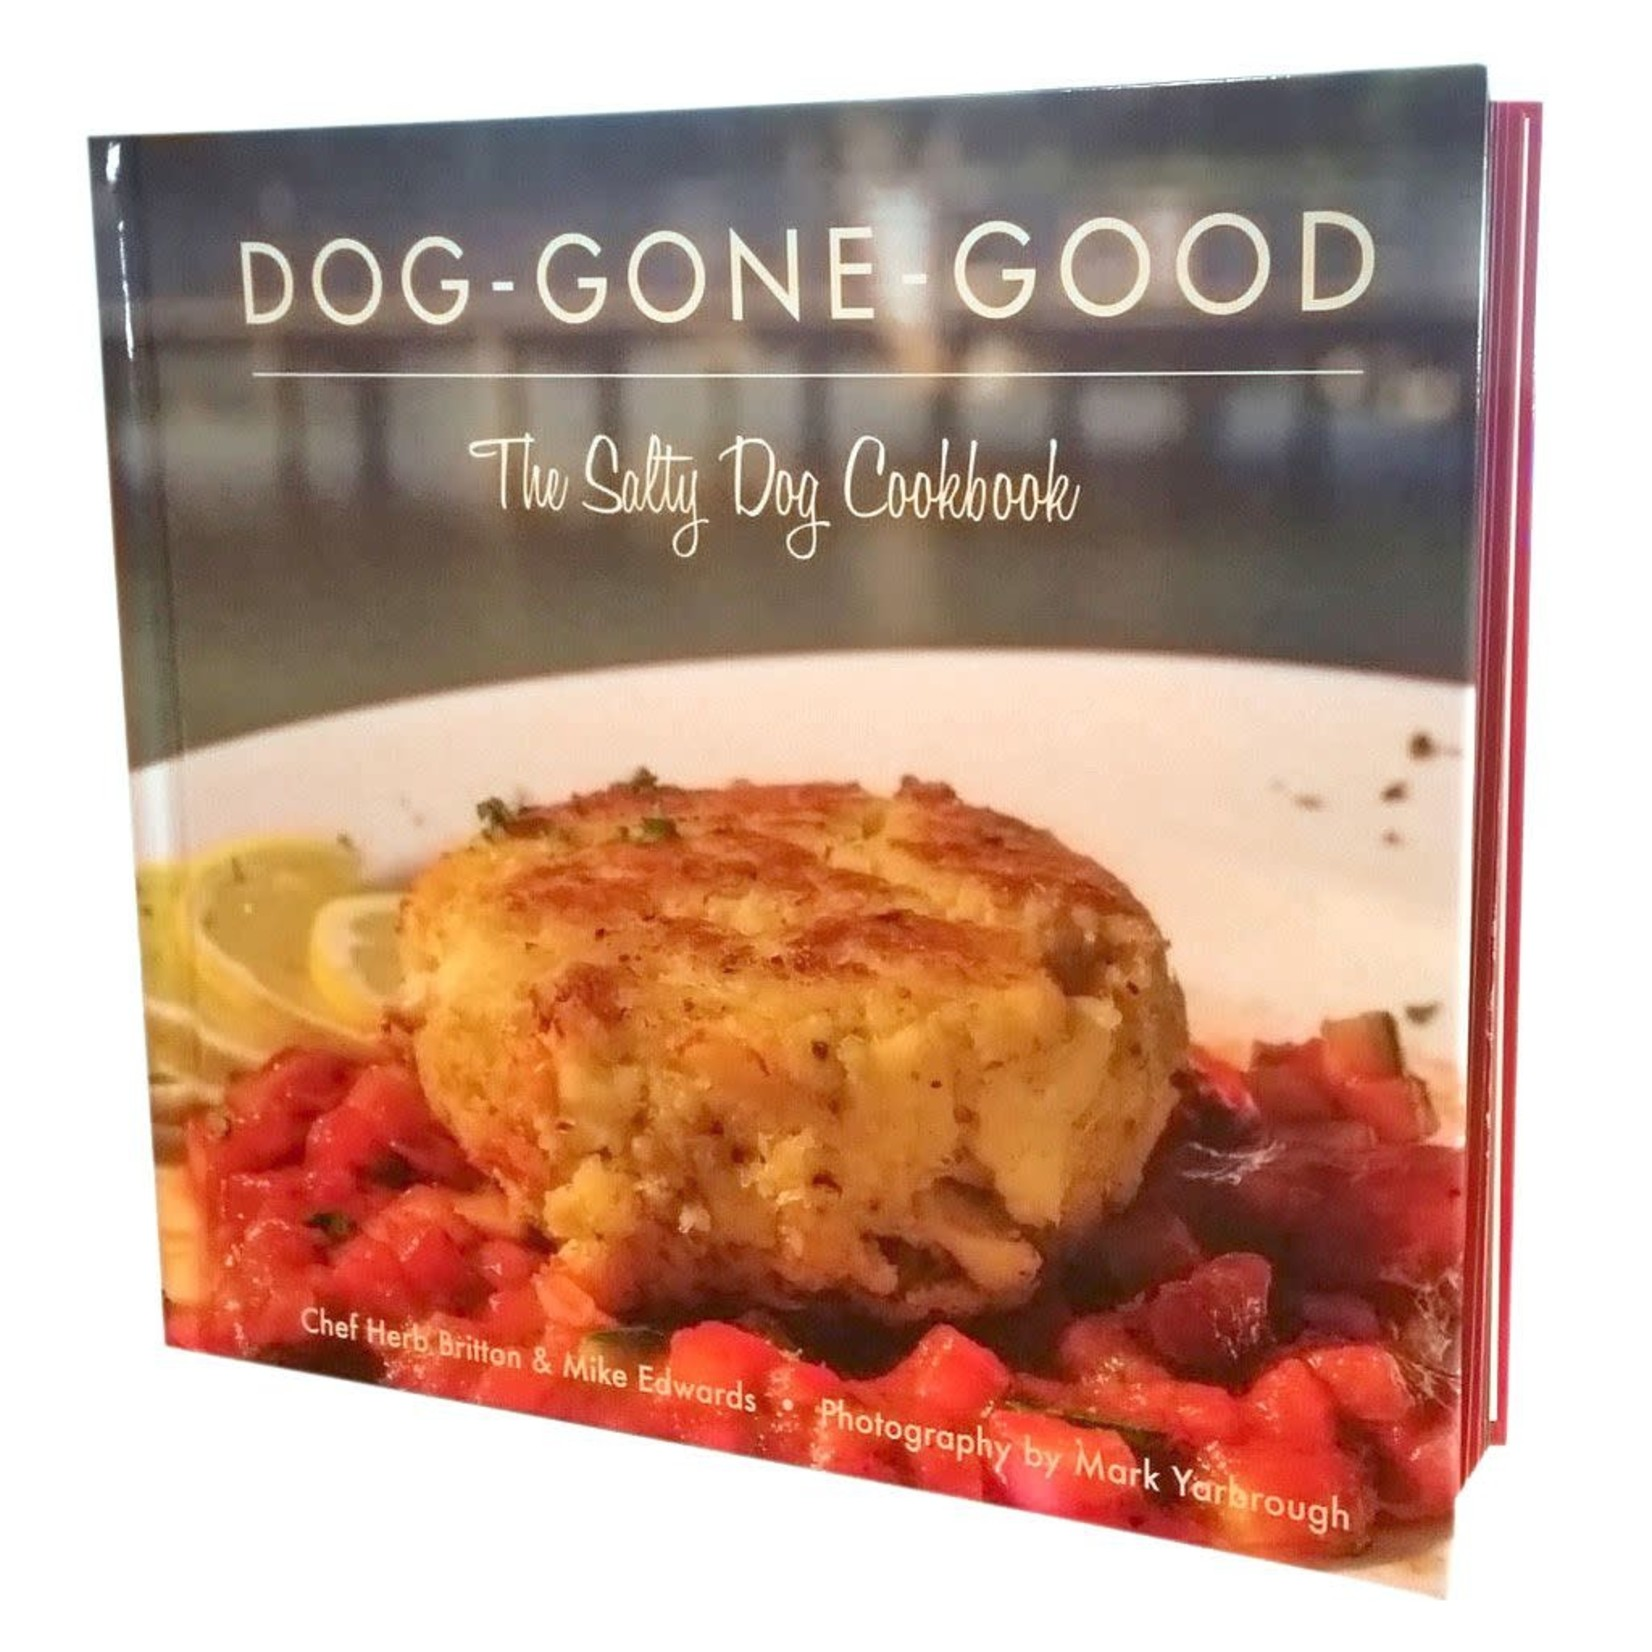 The Salty Dog Cookbook